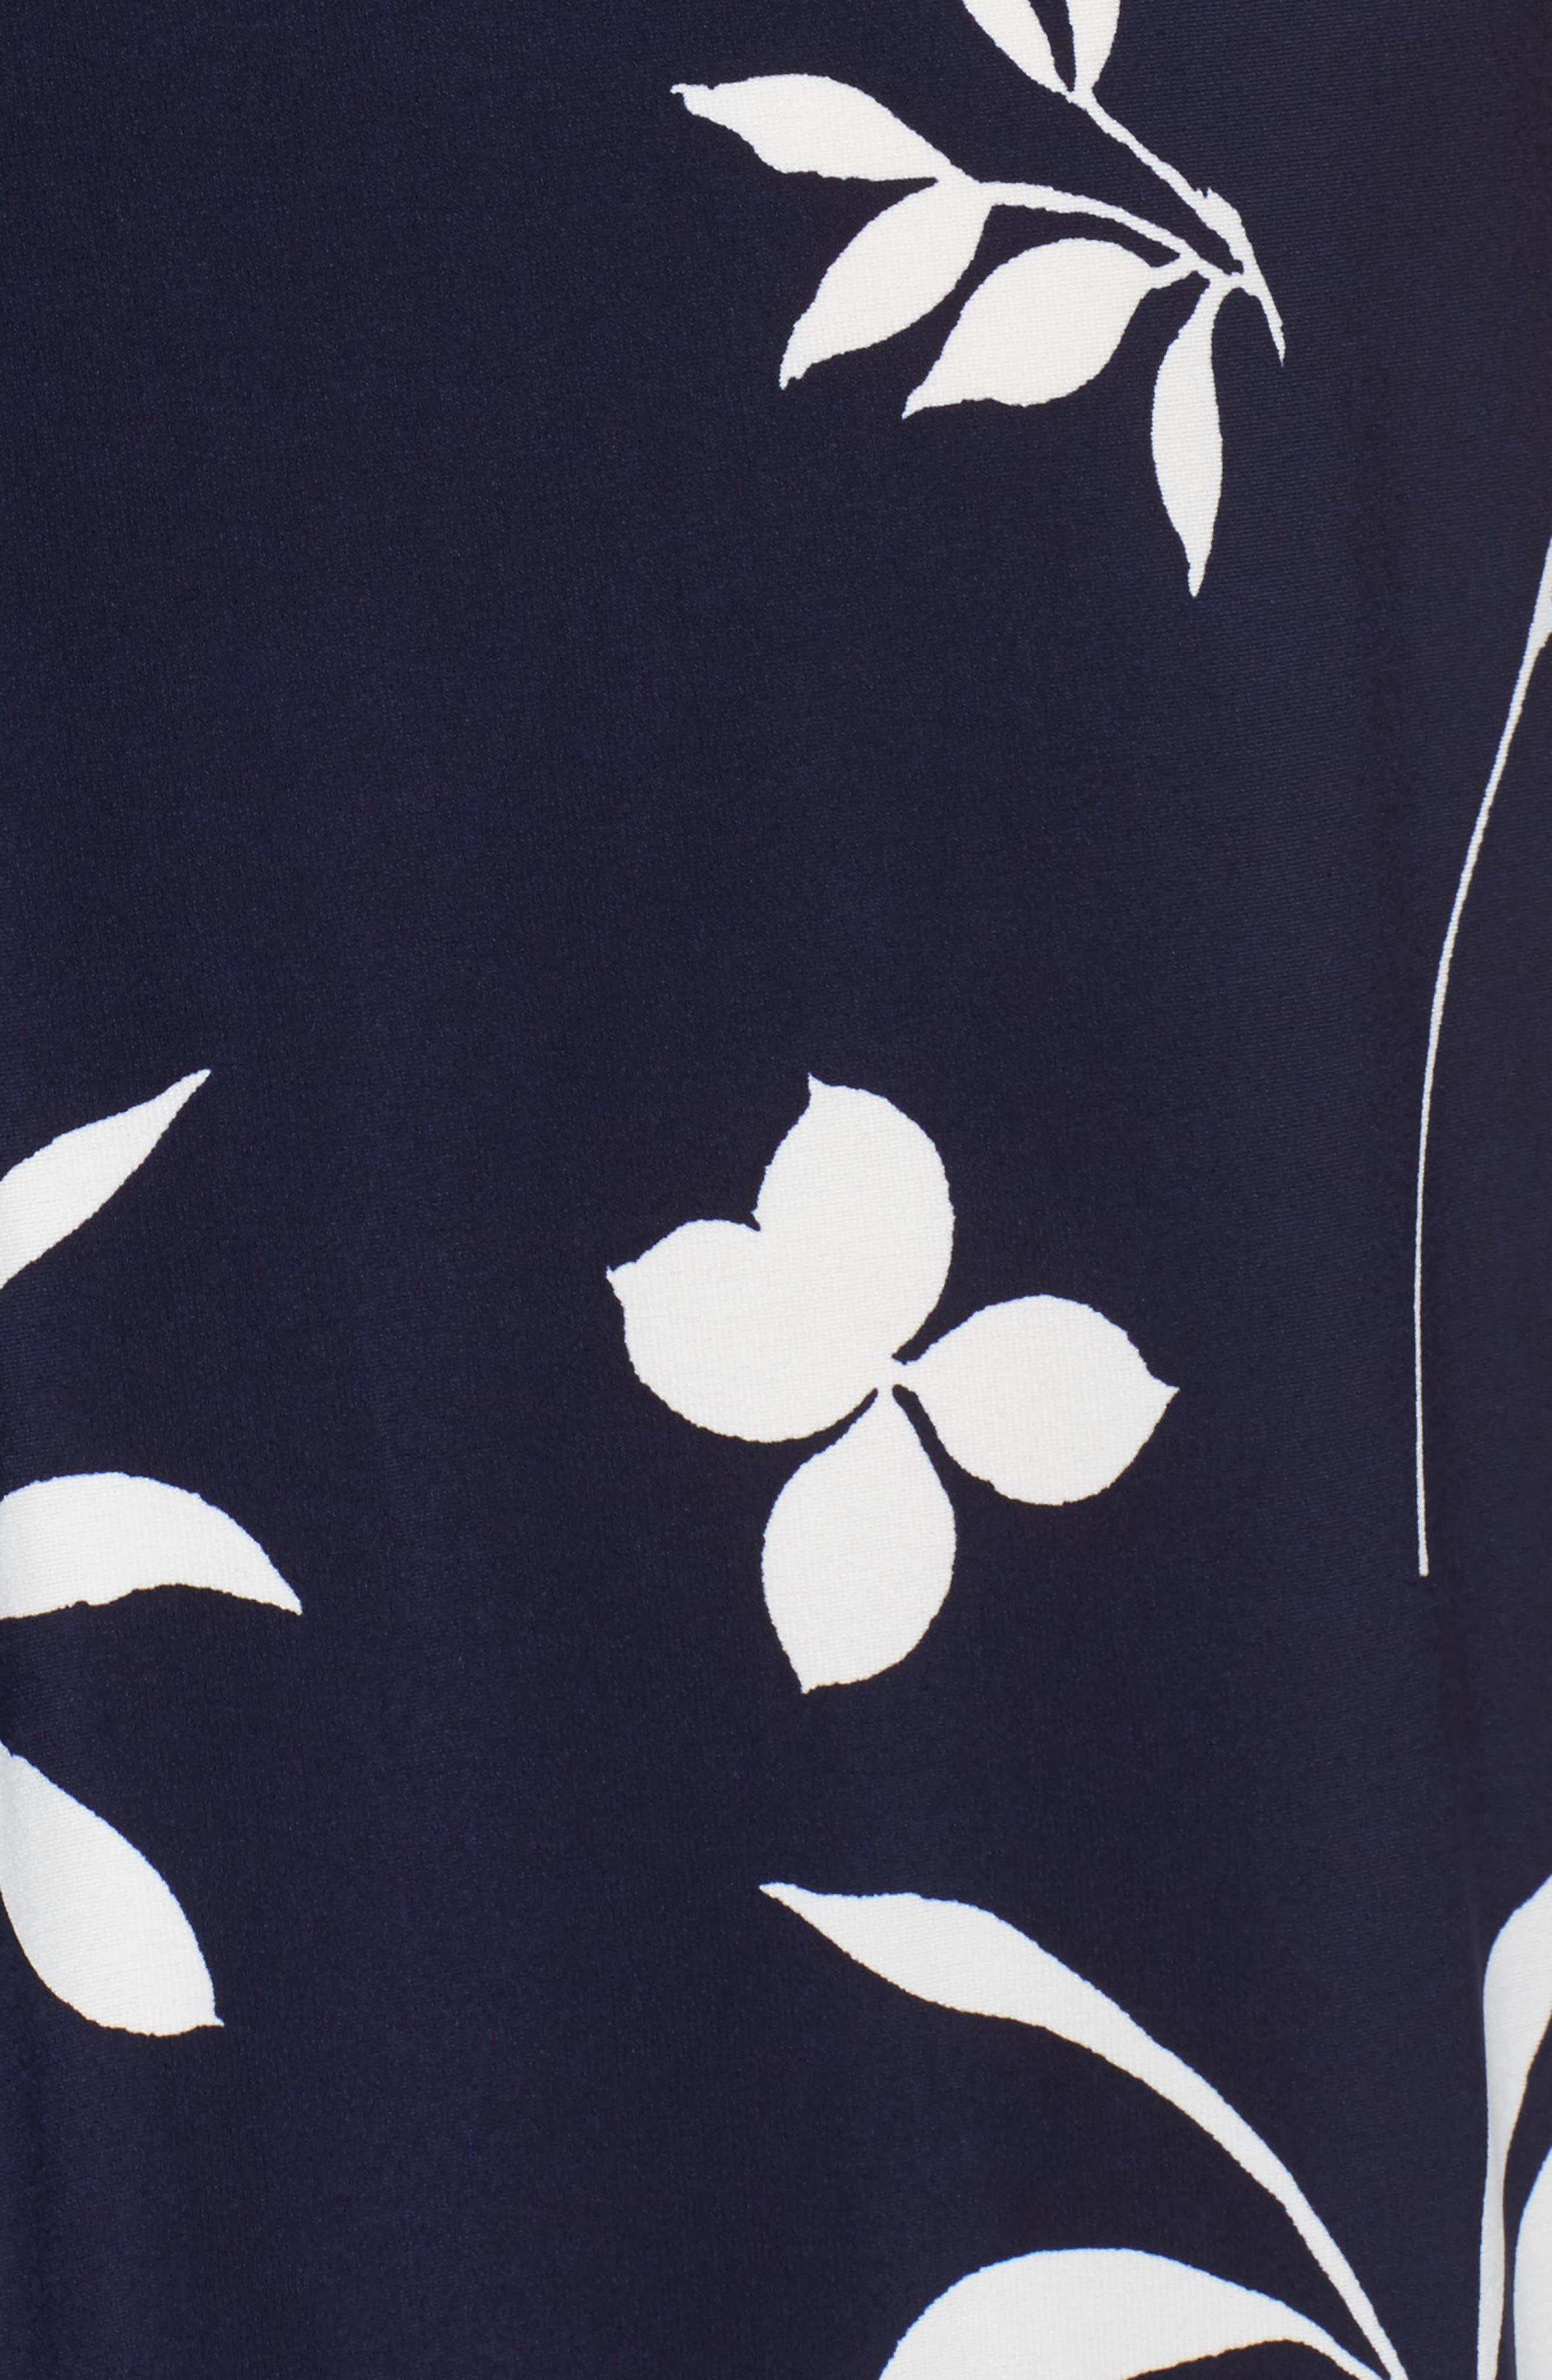 Sleeveless Knot Detail Maxi Dress,                             Alternate thumbnail 5, color,                             407